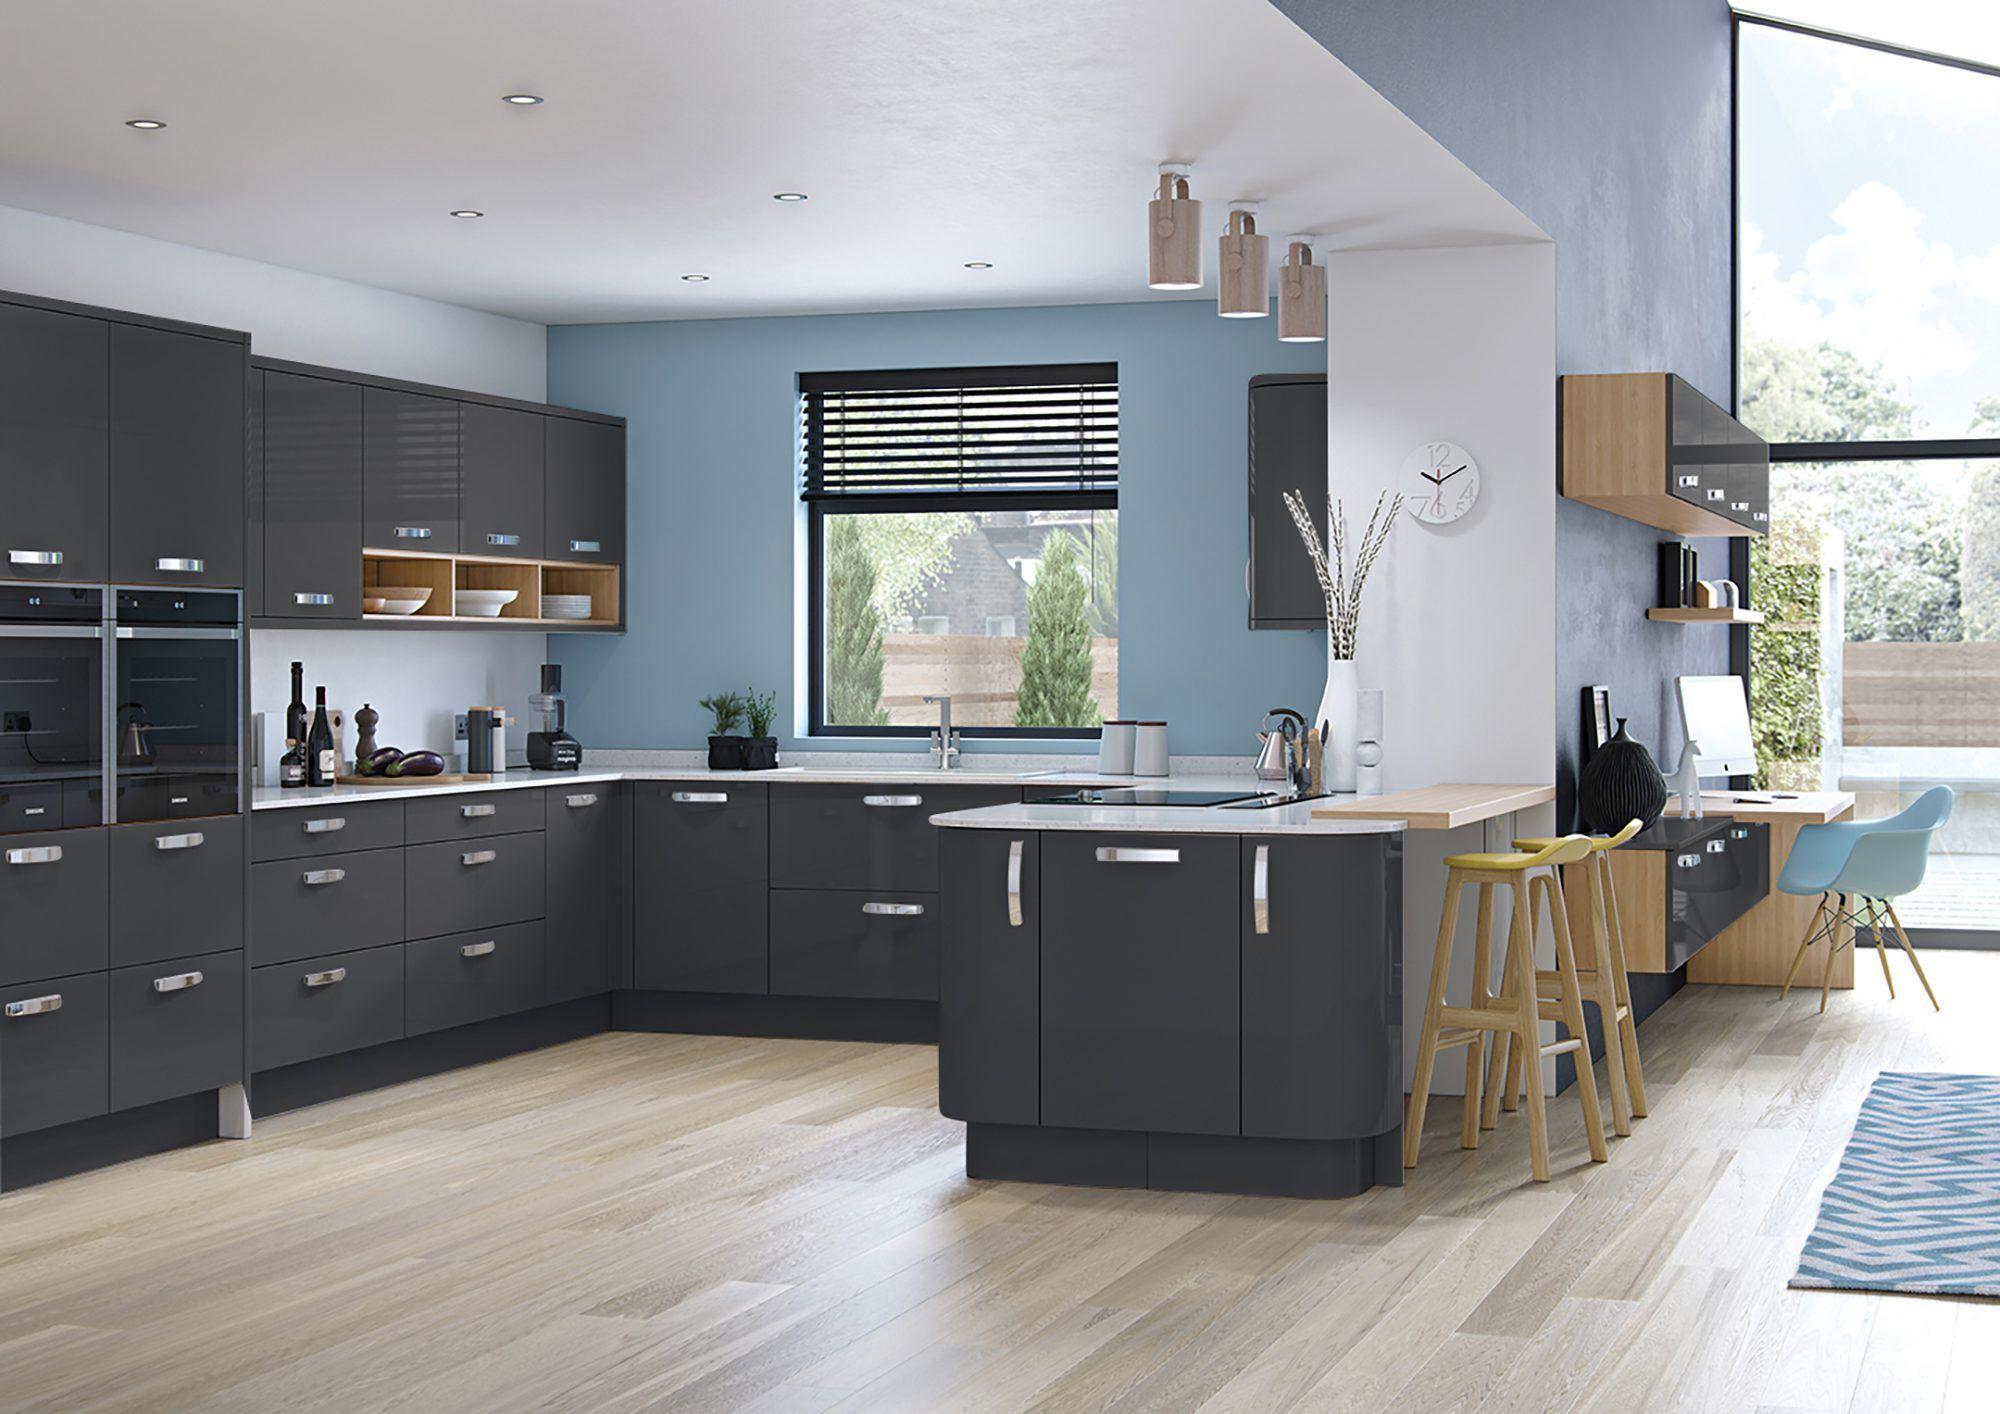 Darga - Caple : Caple on Images Of Modern Kitchens  id=96748